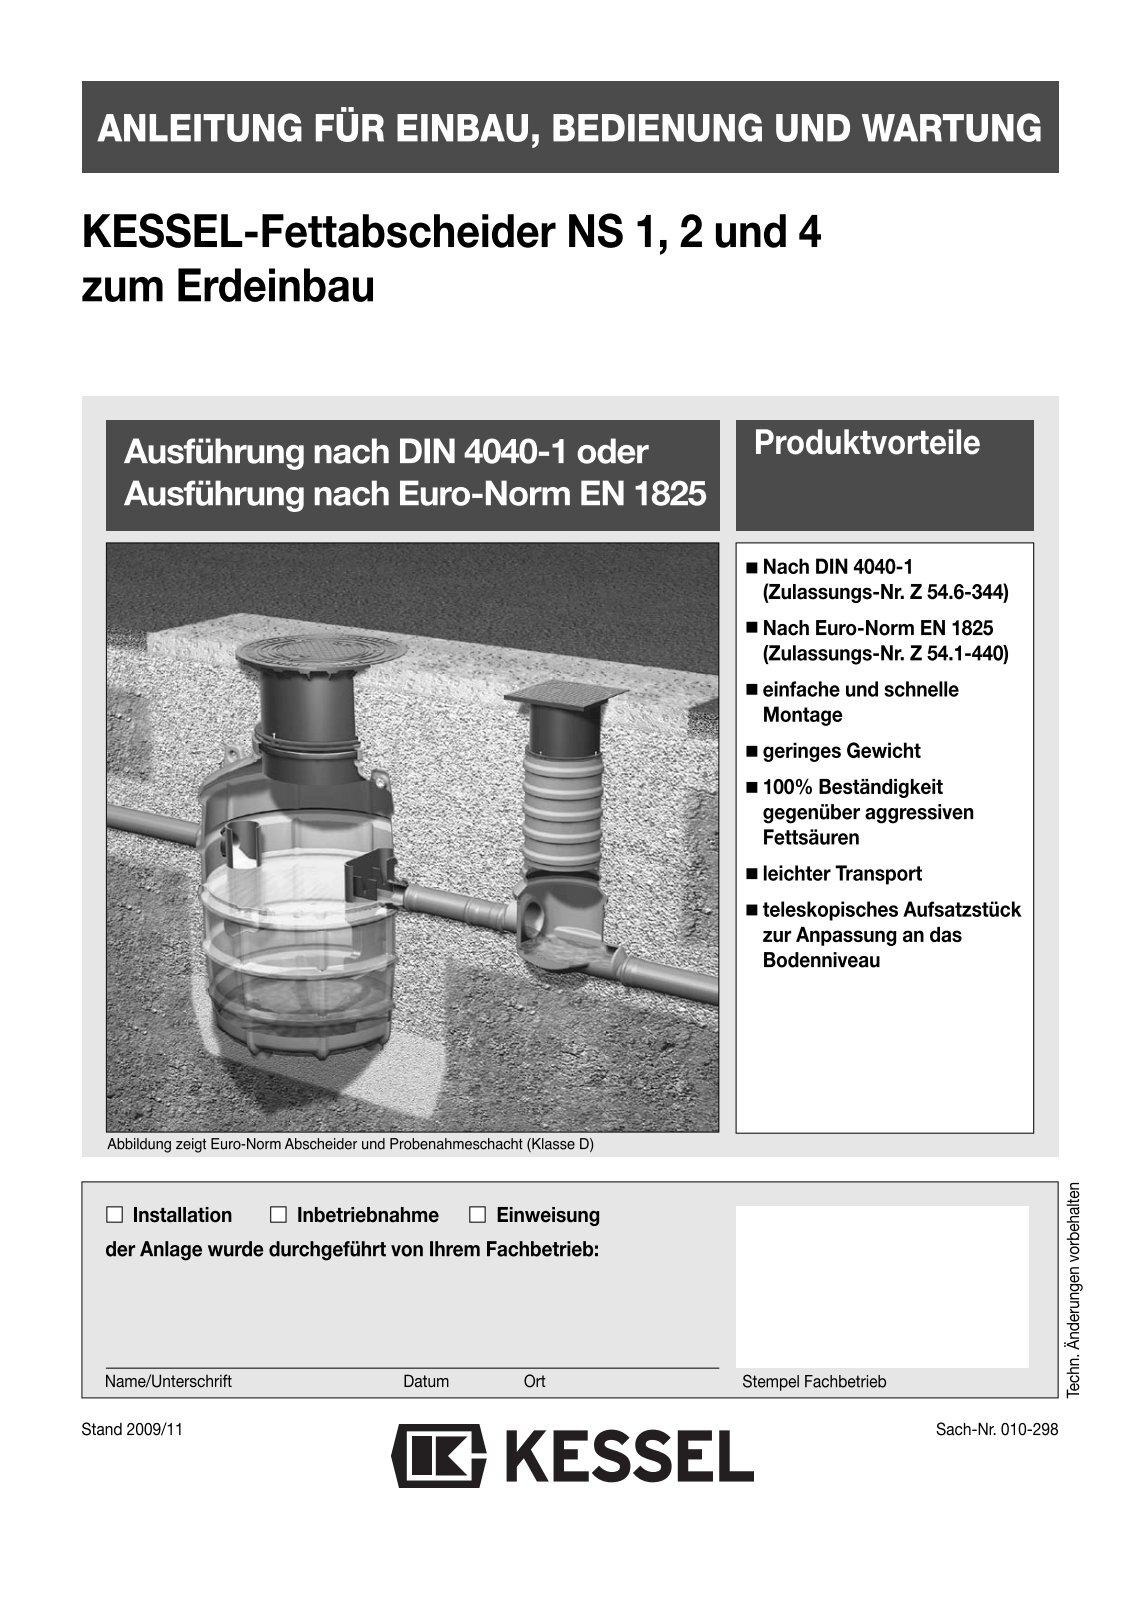 Großzügig Verdrahtung Eines Kessels Galerie - Schaltplan Serie ...